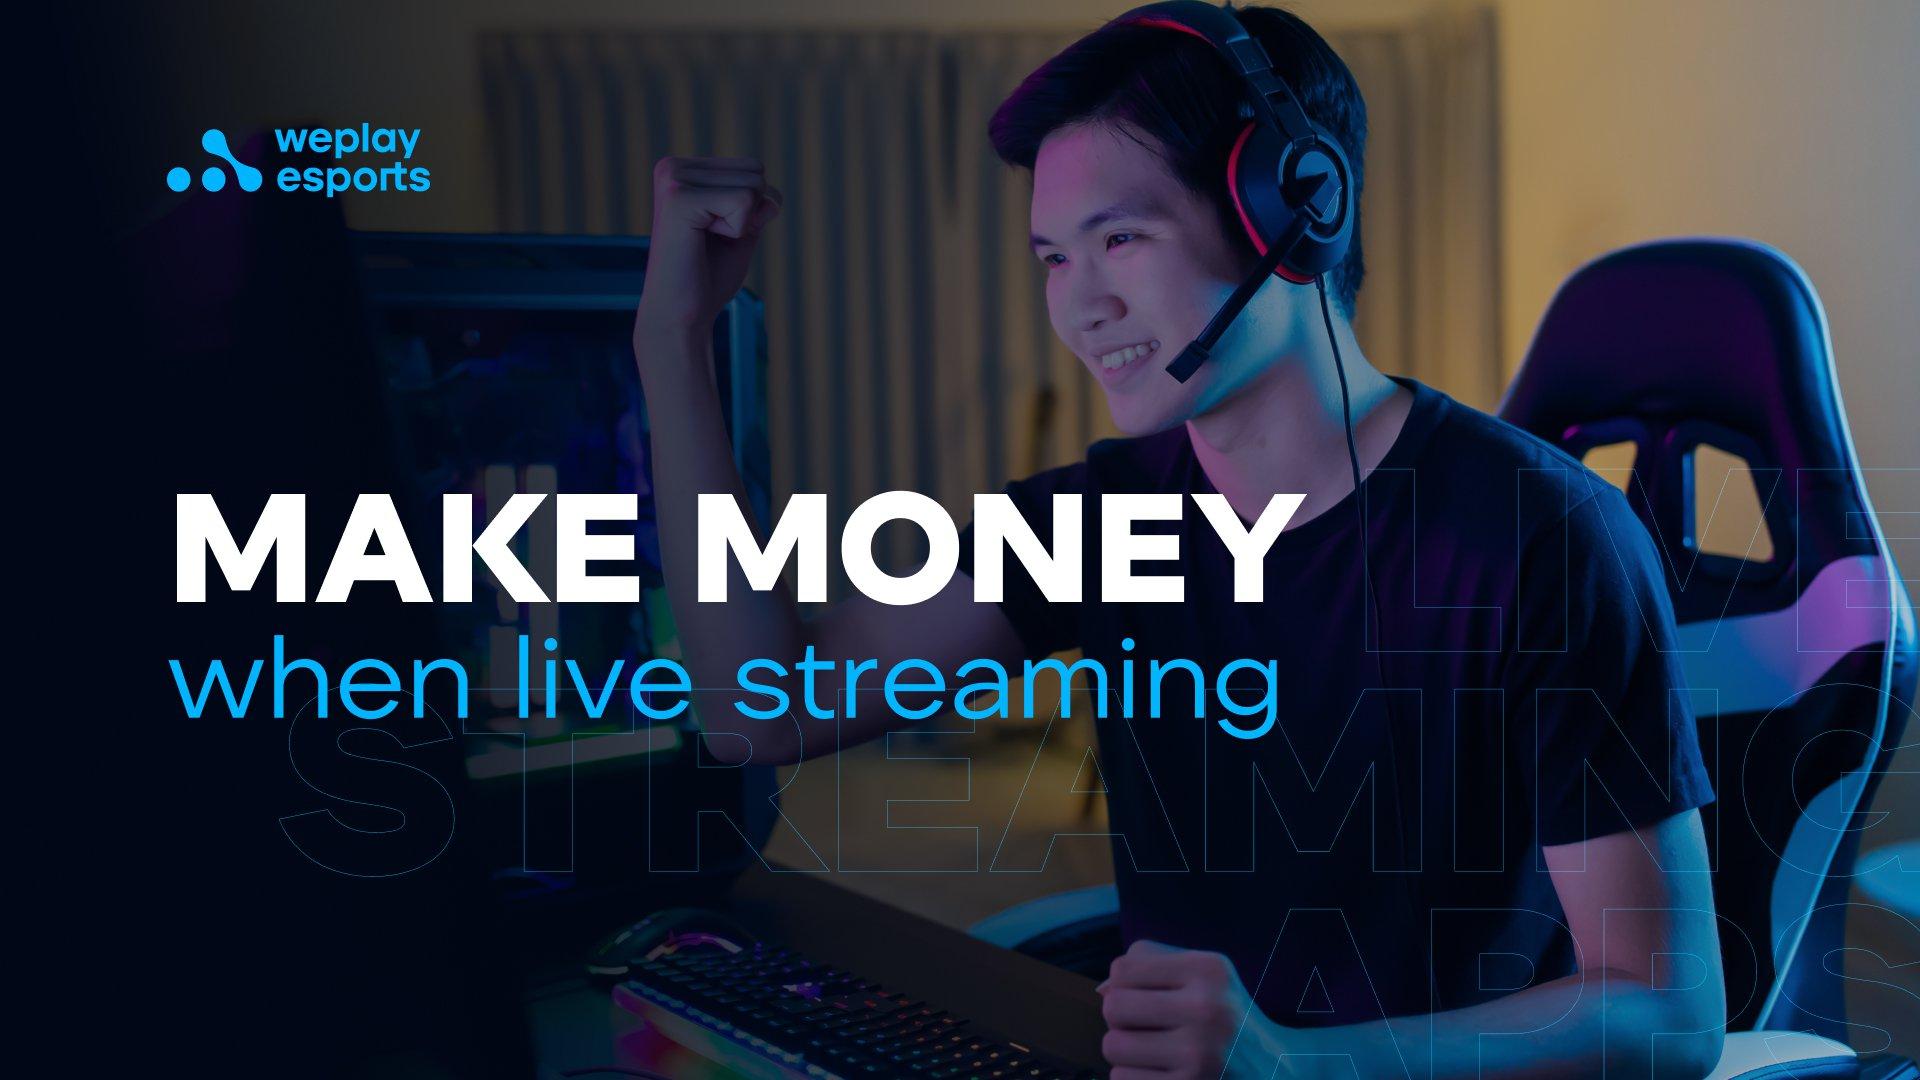 Make money when live streaming